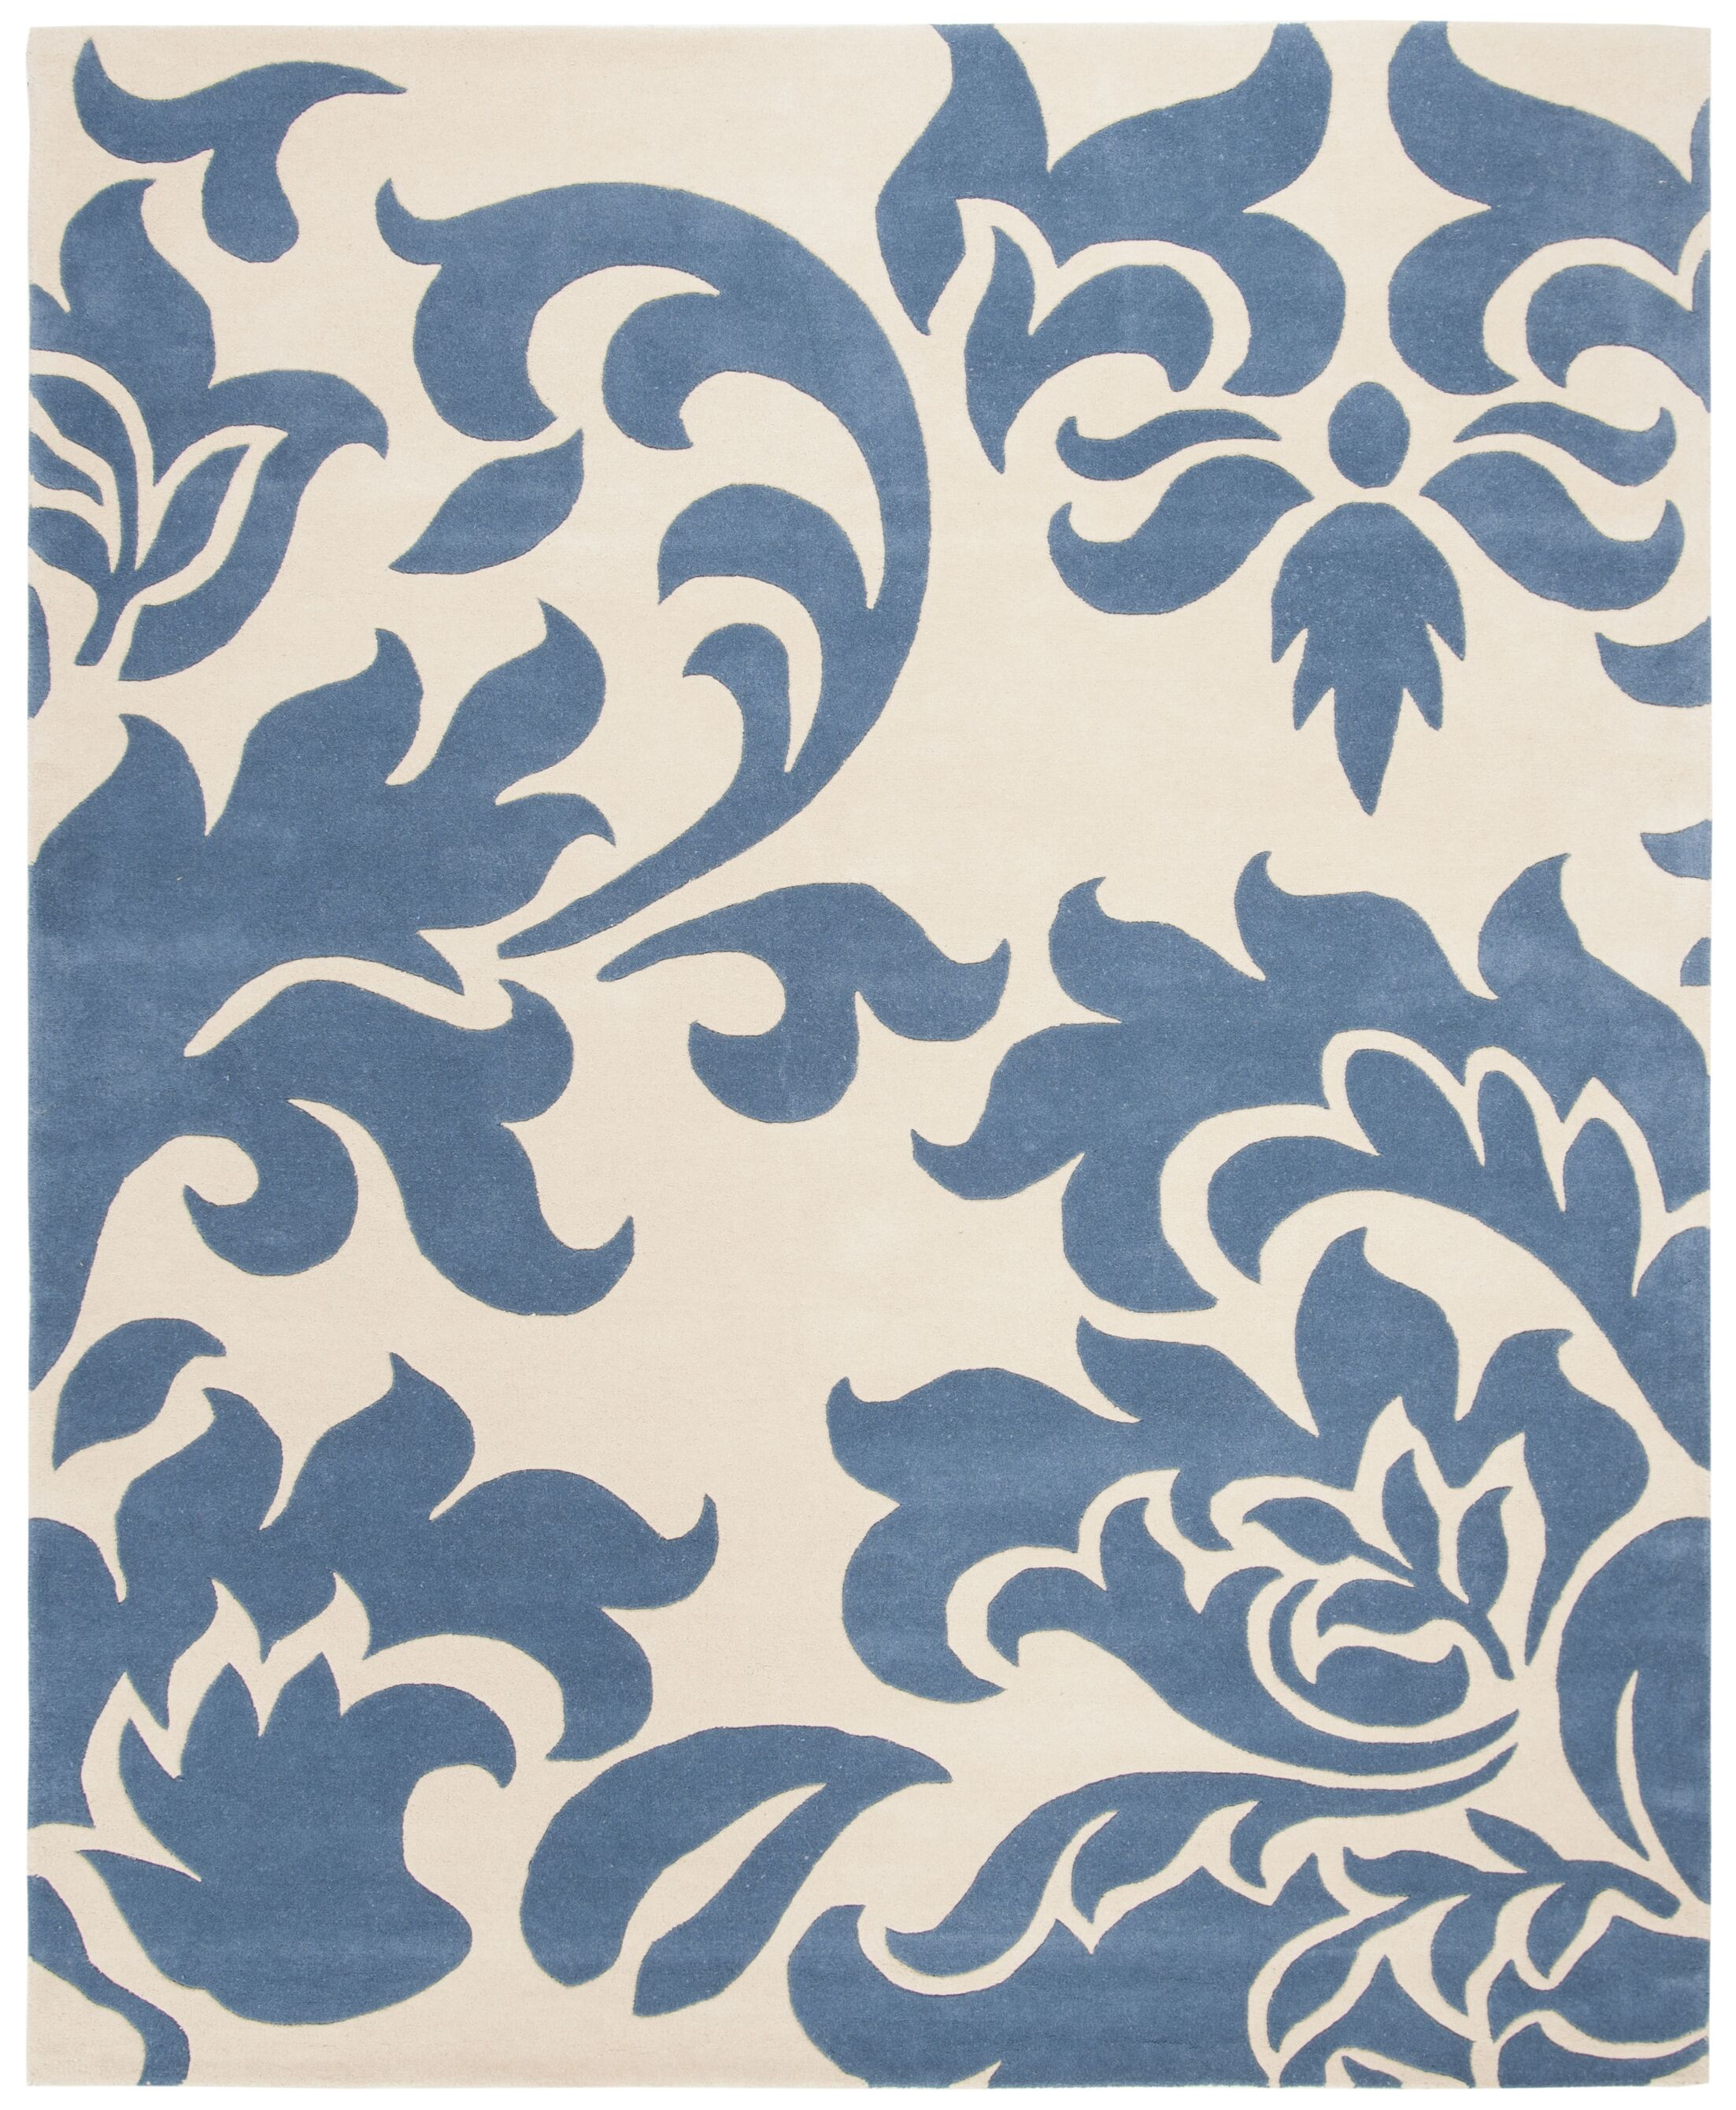 Martha Stewart Barcelona Tufted / Hand Loomed Blue/Beige Area Rug Rug Size: Rectangle 8' x 10'